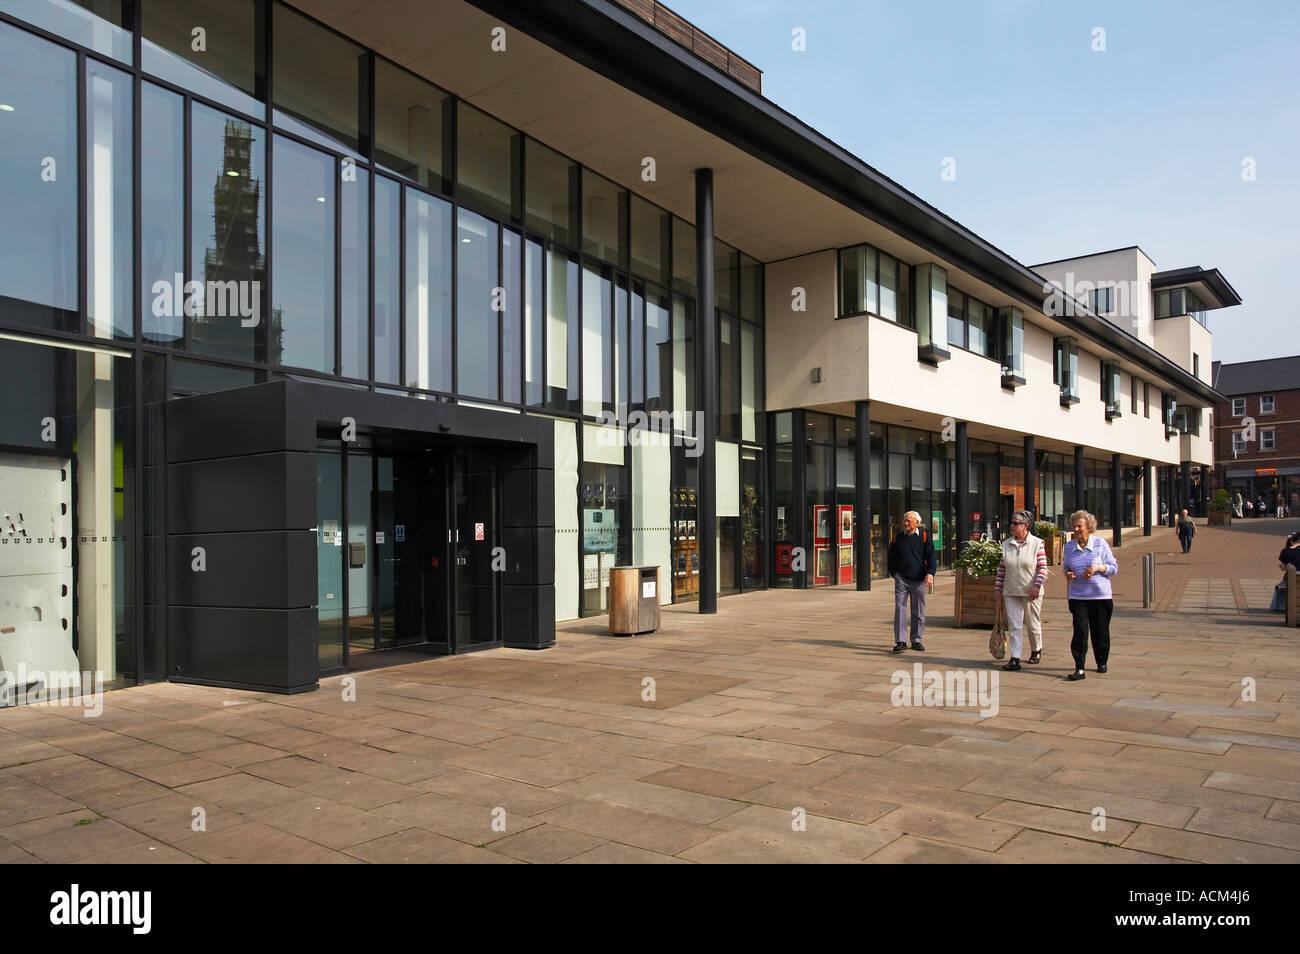 Gala Theatre Durham City England Stock Photo 7534373 Alamy